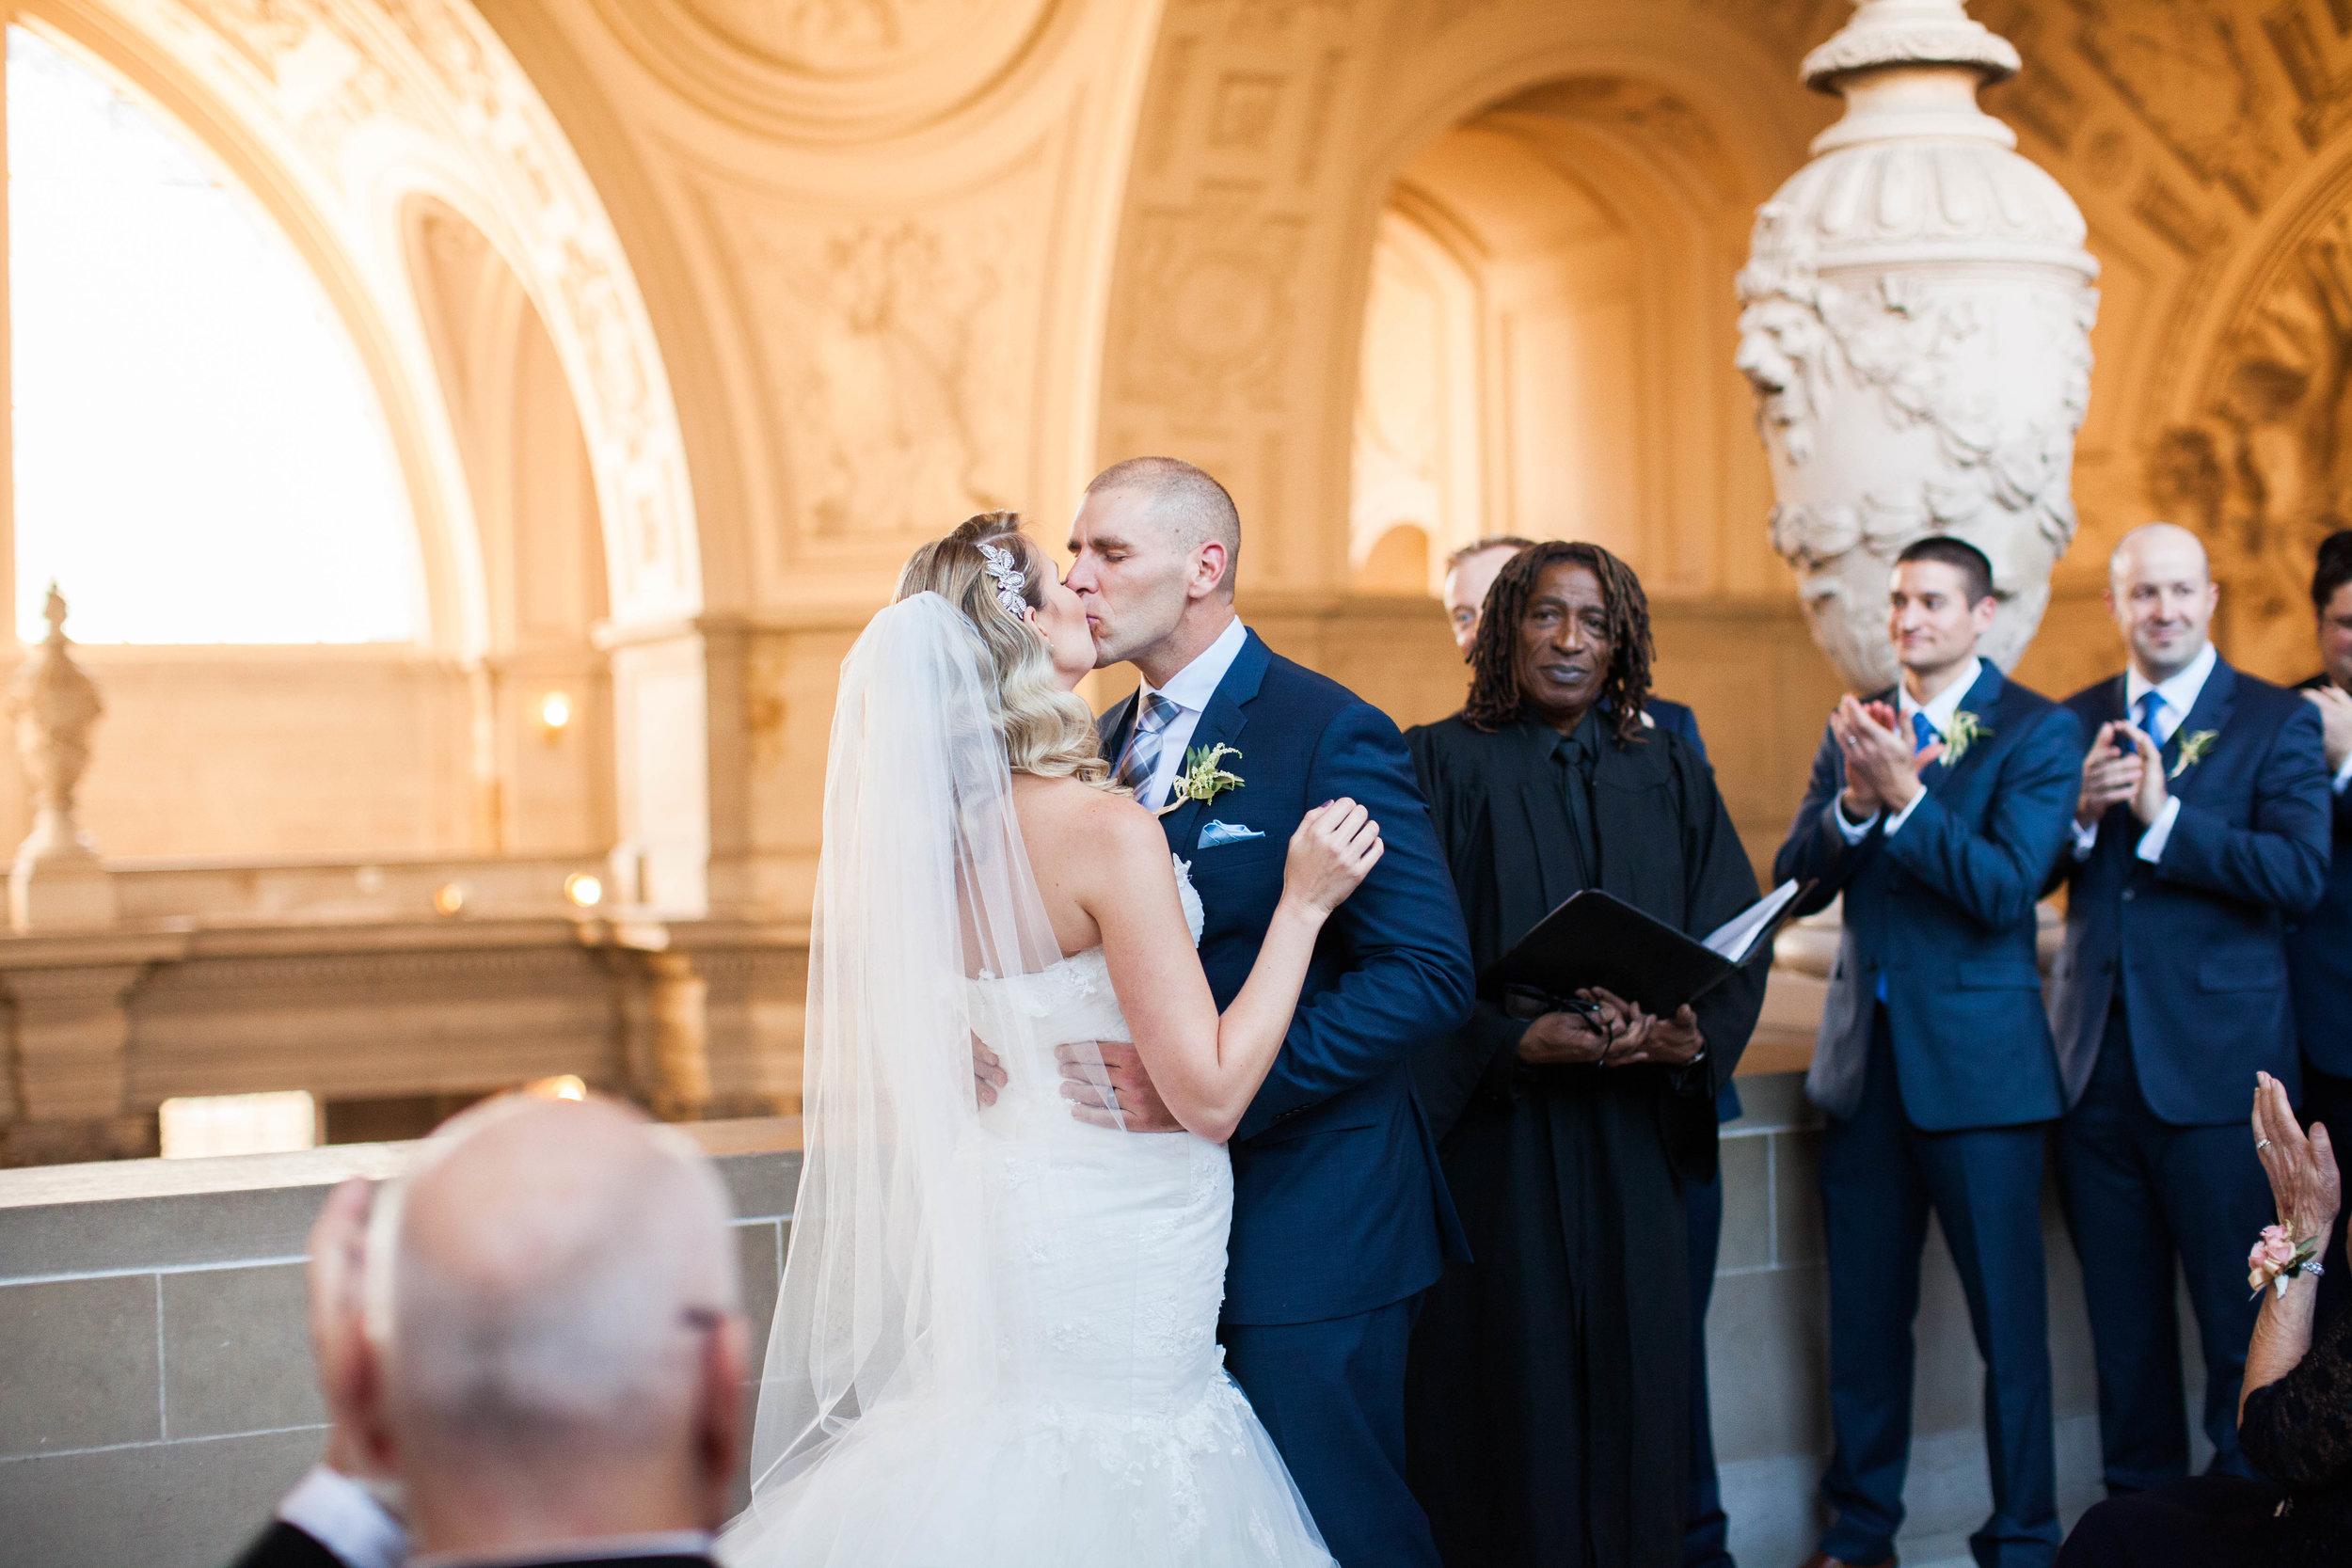 san-francisco-city-hall-wedding-kimberly-macdonald-photography665 copy.jpg